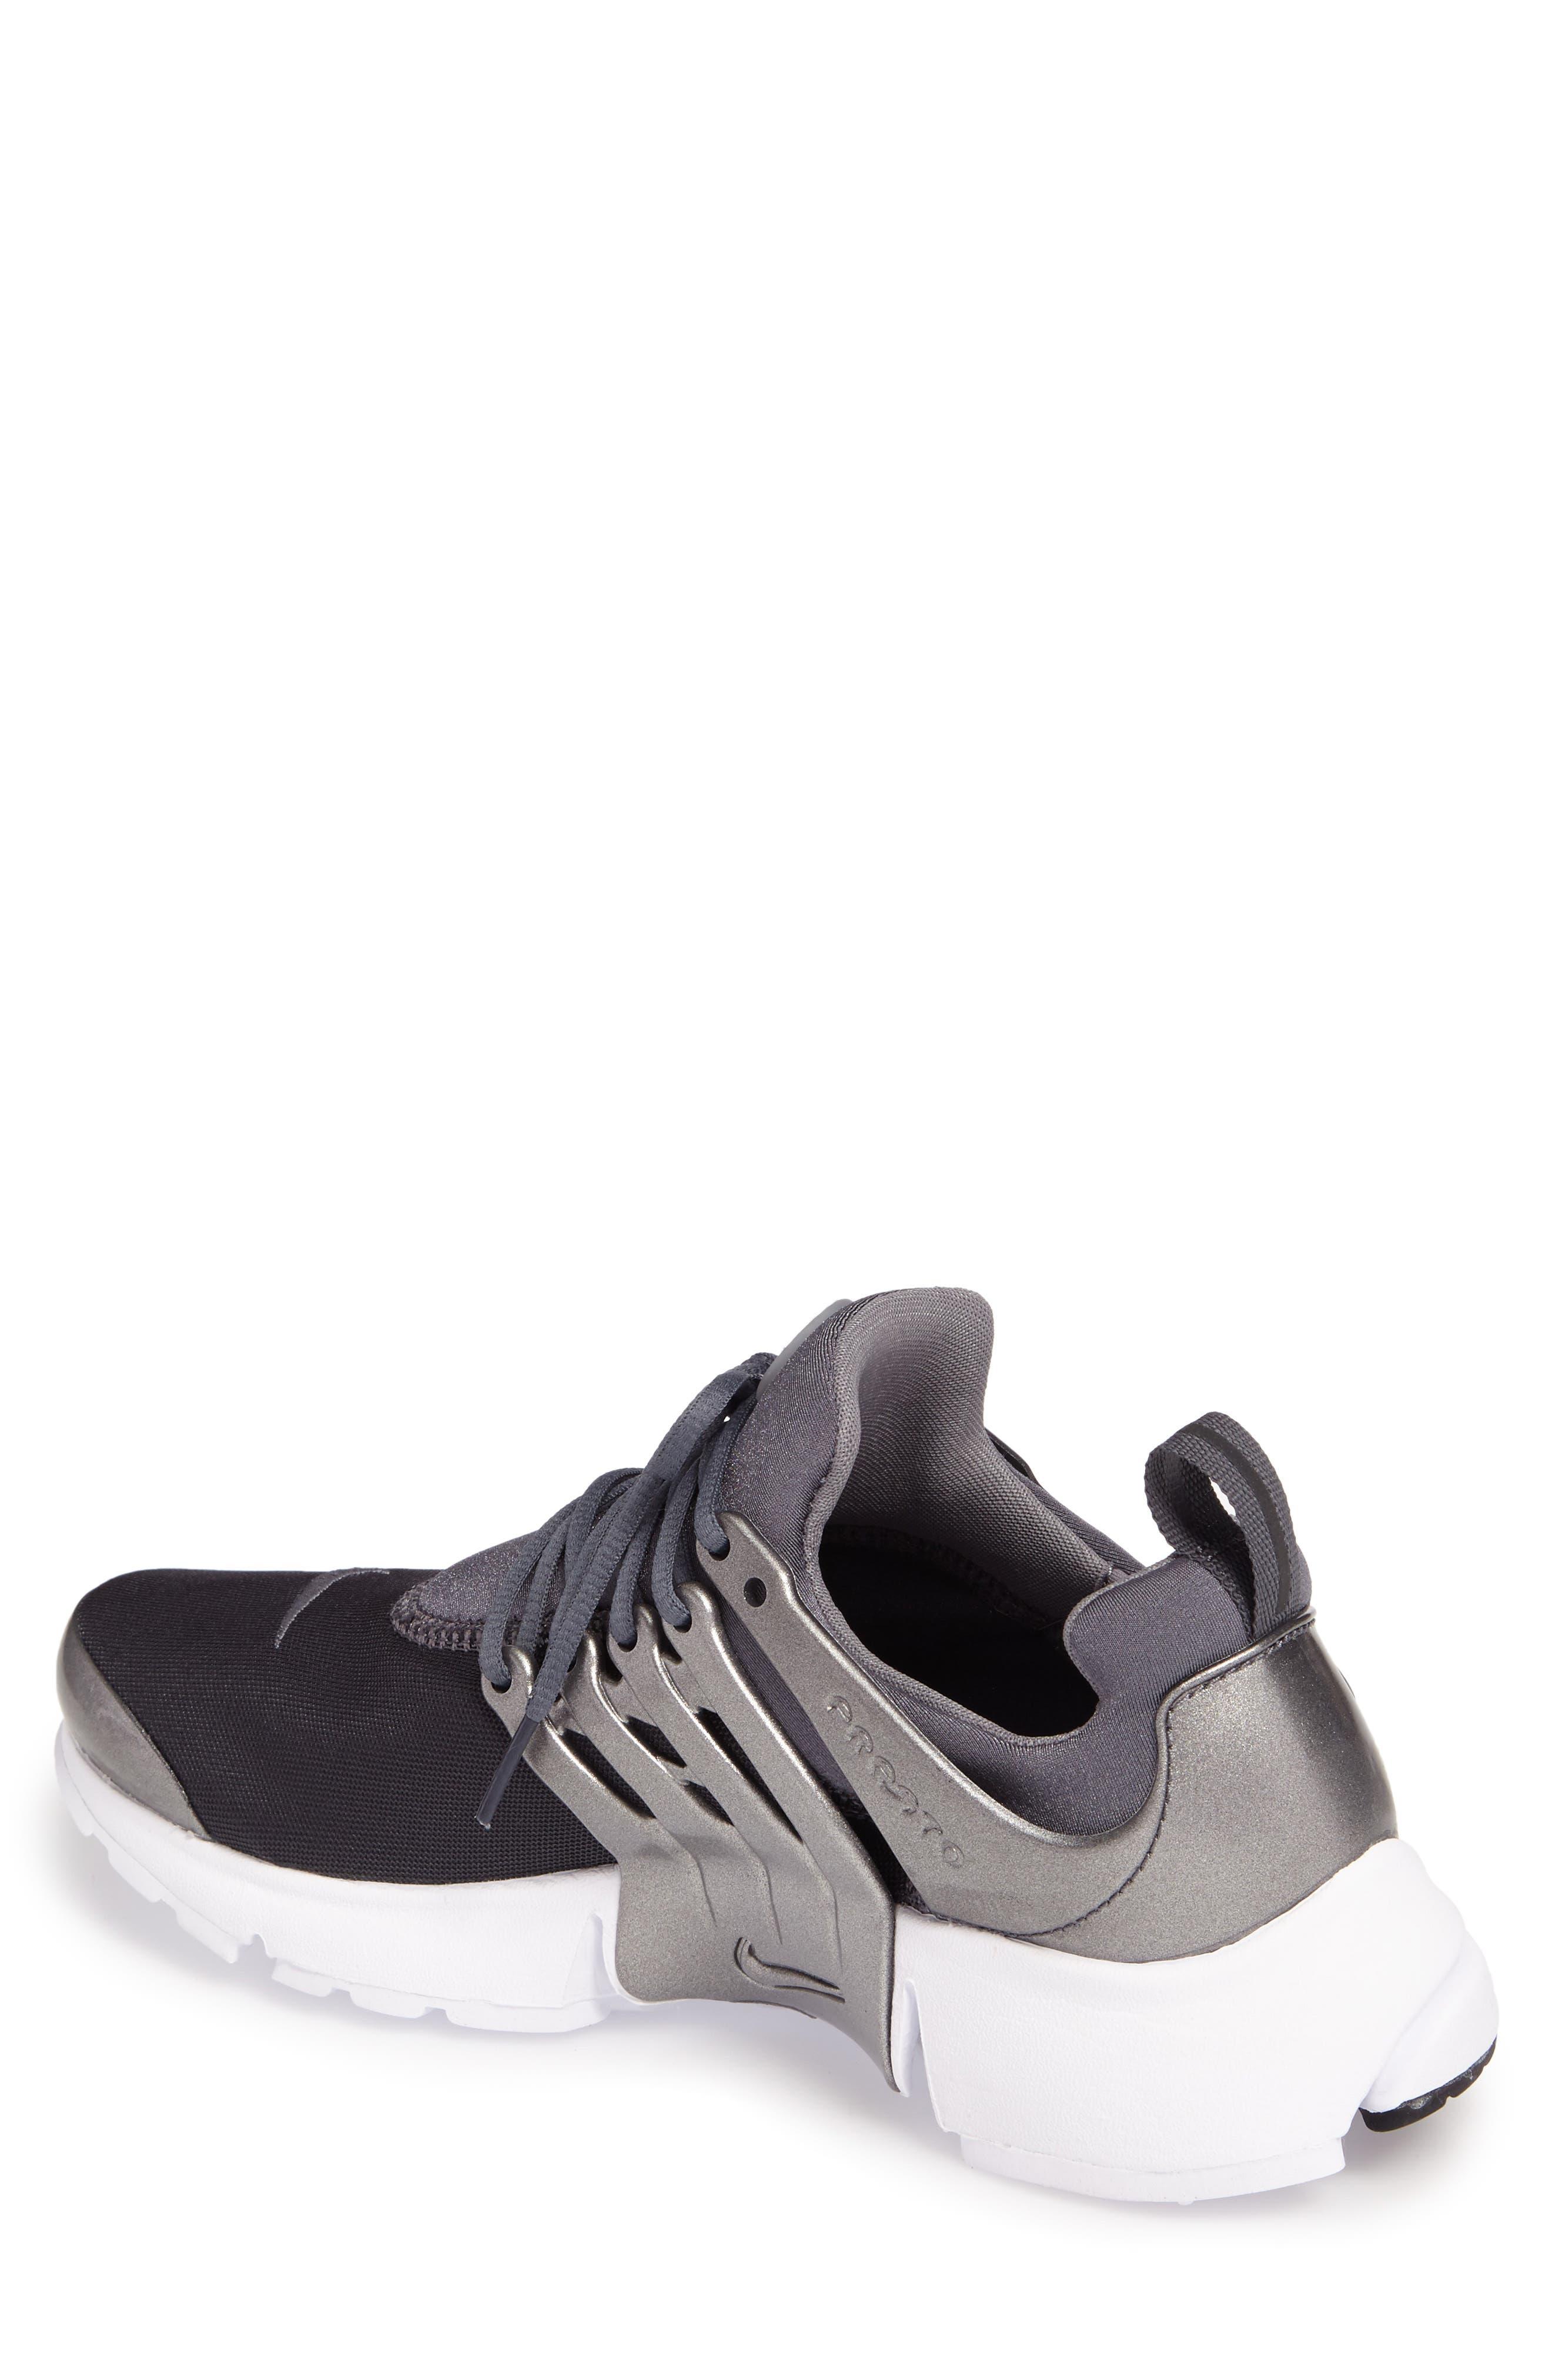 Alternate Image 2  - Nike Air Presto Premium Sneaker (Men)